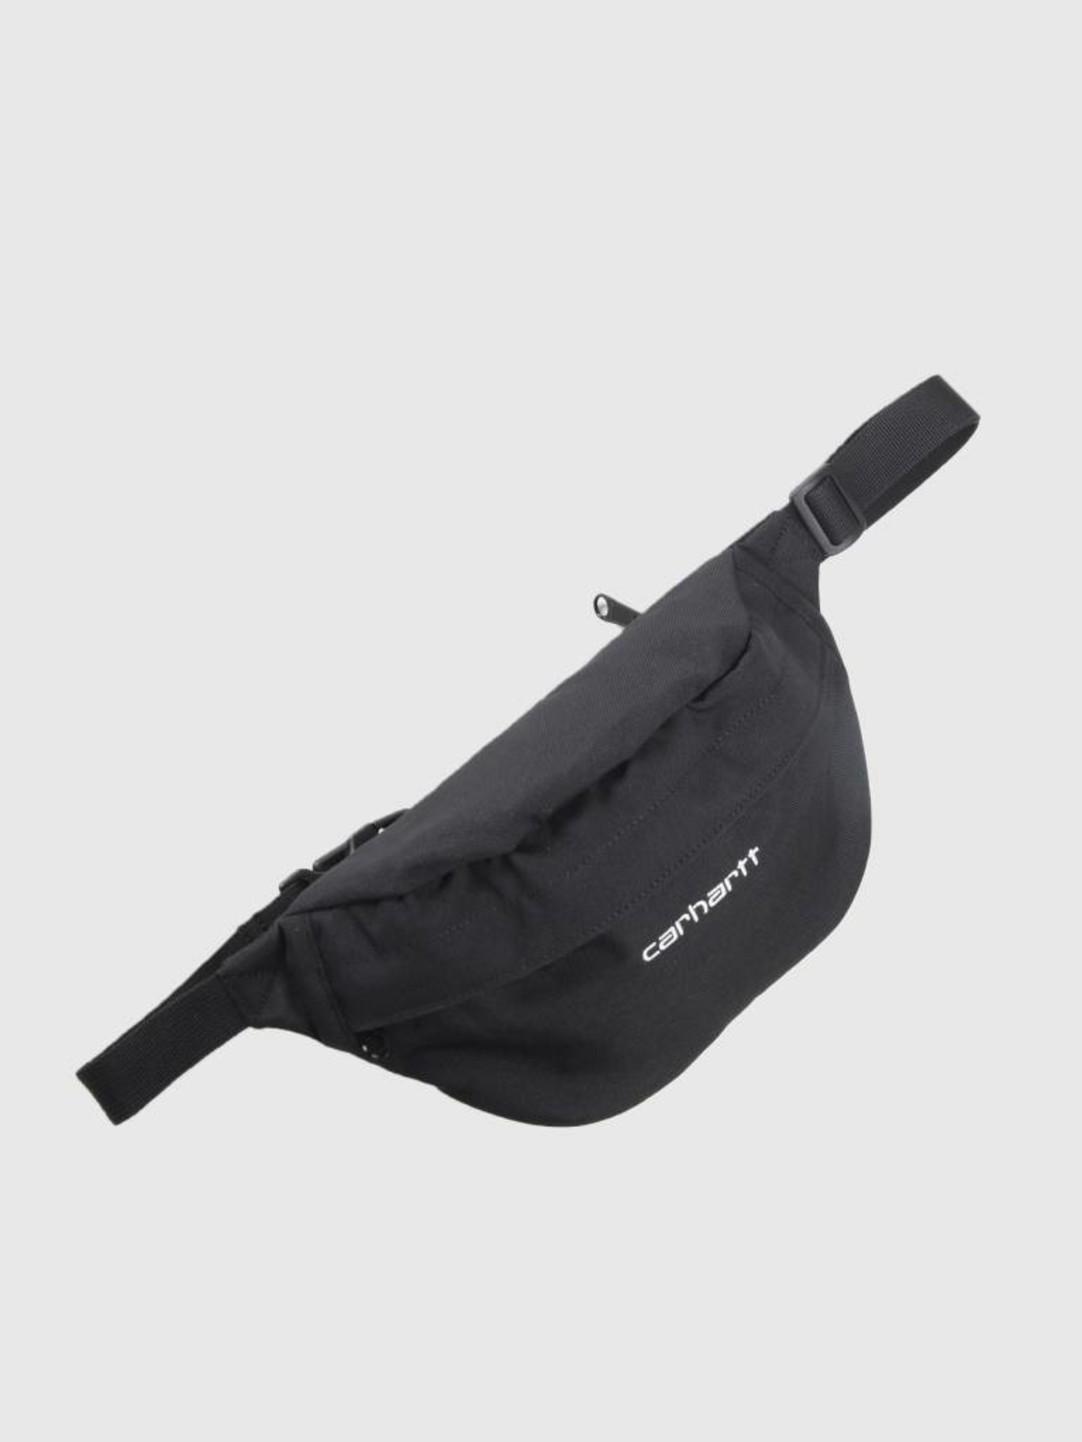 Carhartt WIP Carhartt WIP Payton Hip Bag Black White I025742-8990